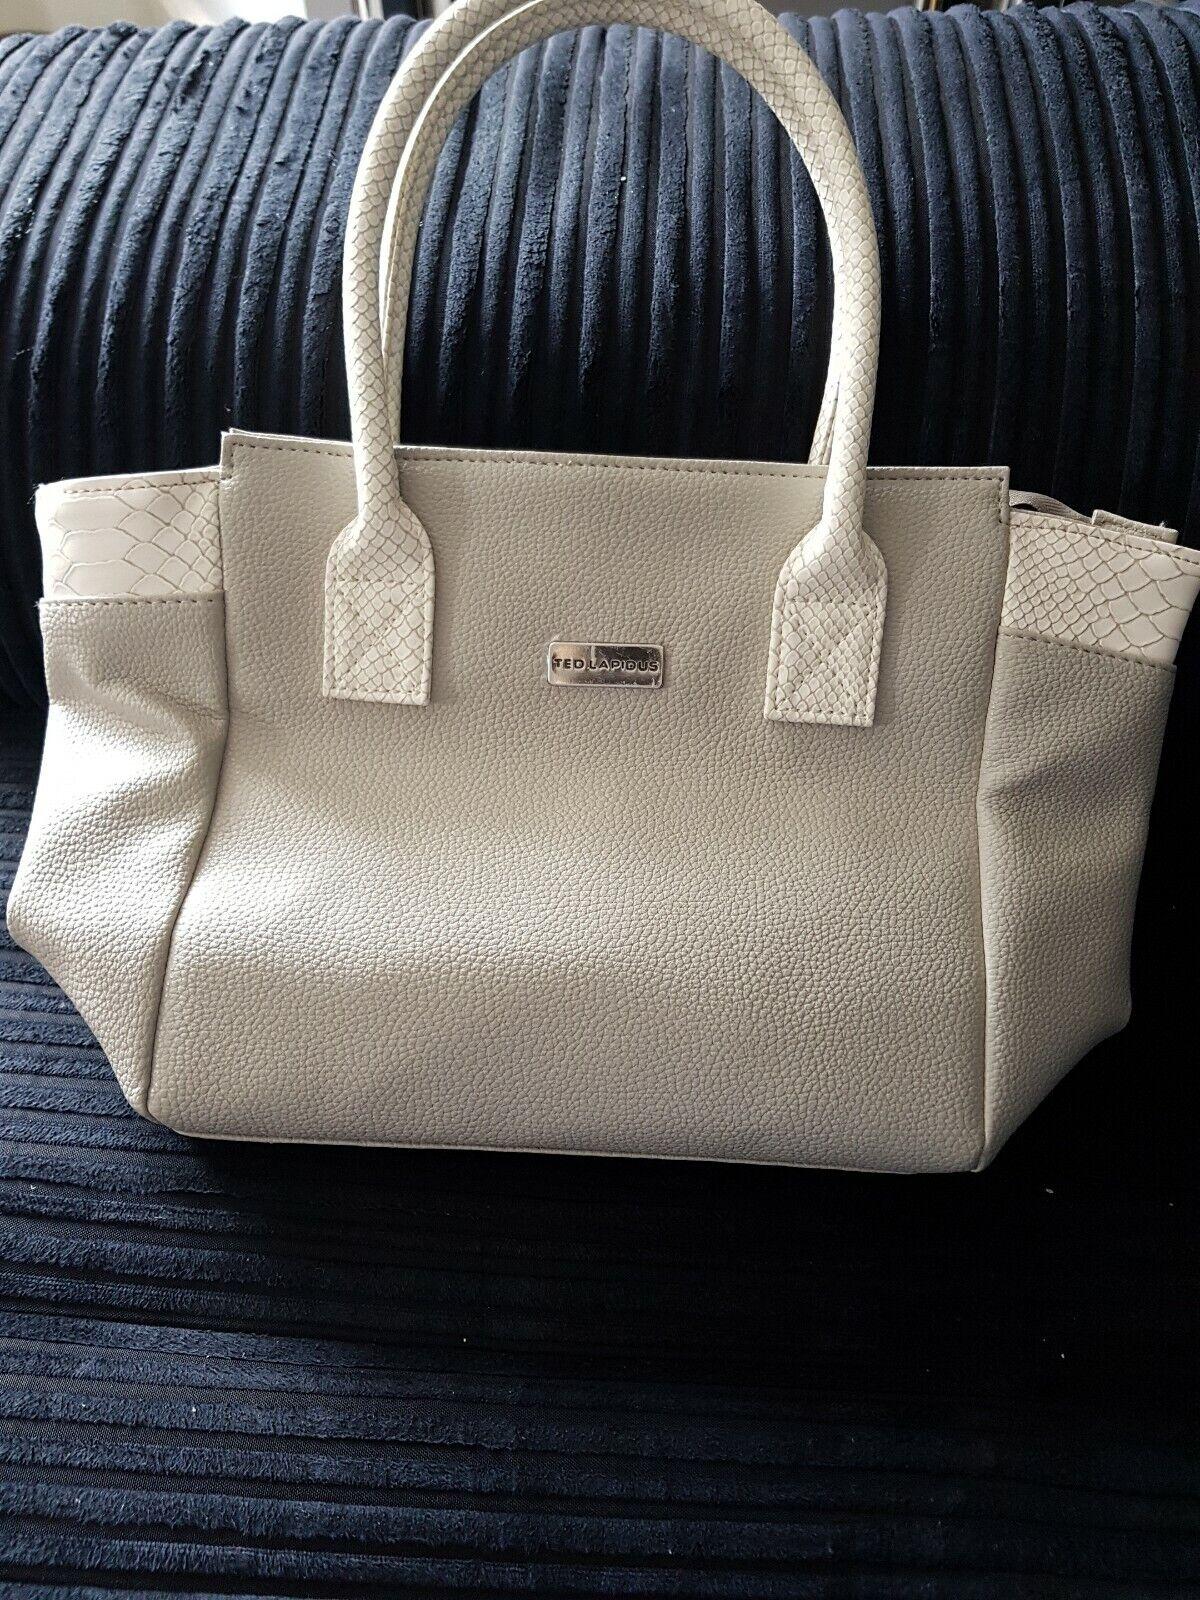 Ted Lapidus Pale Grey Shoulder / Cross Body Bag NWOT